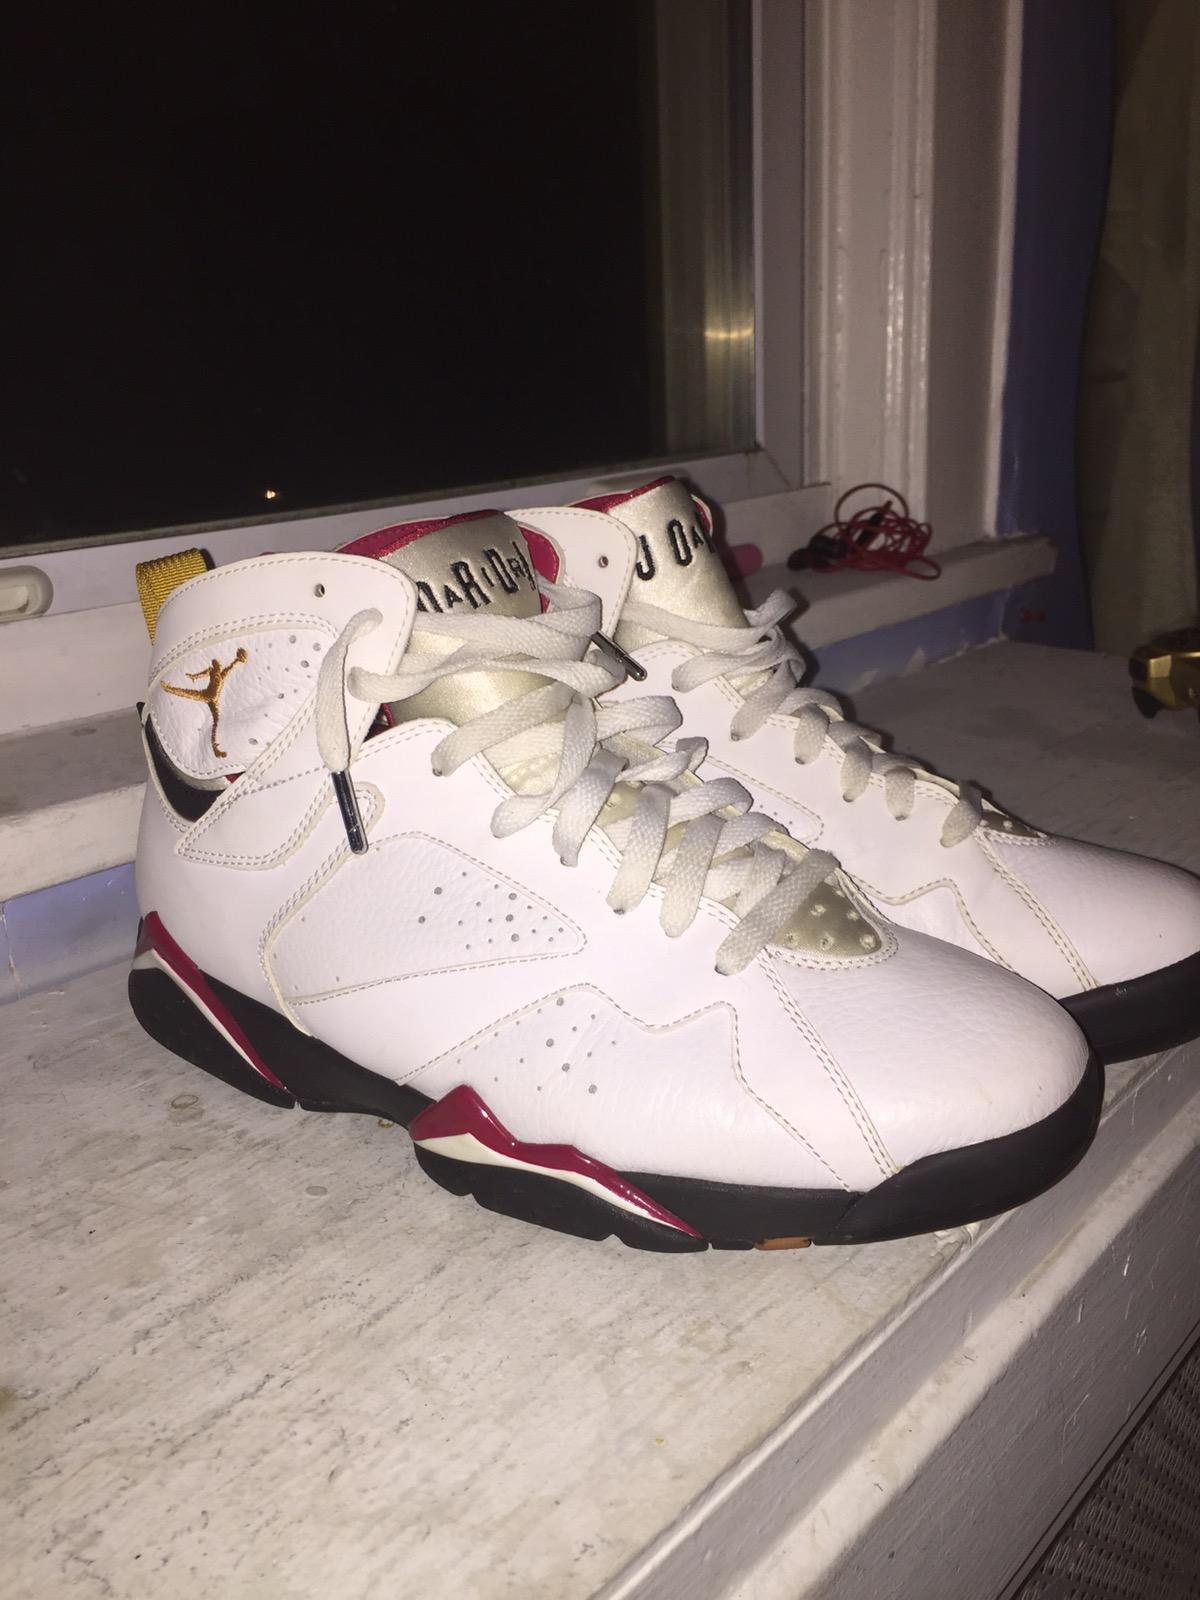 reputable site 91478 3efc7 Air Jordan Cardinal 7s 2011 Release LAST PRICE DROP!!!1